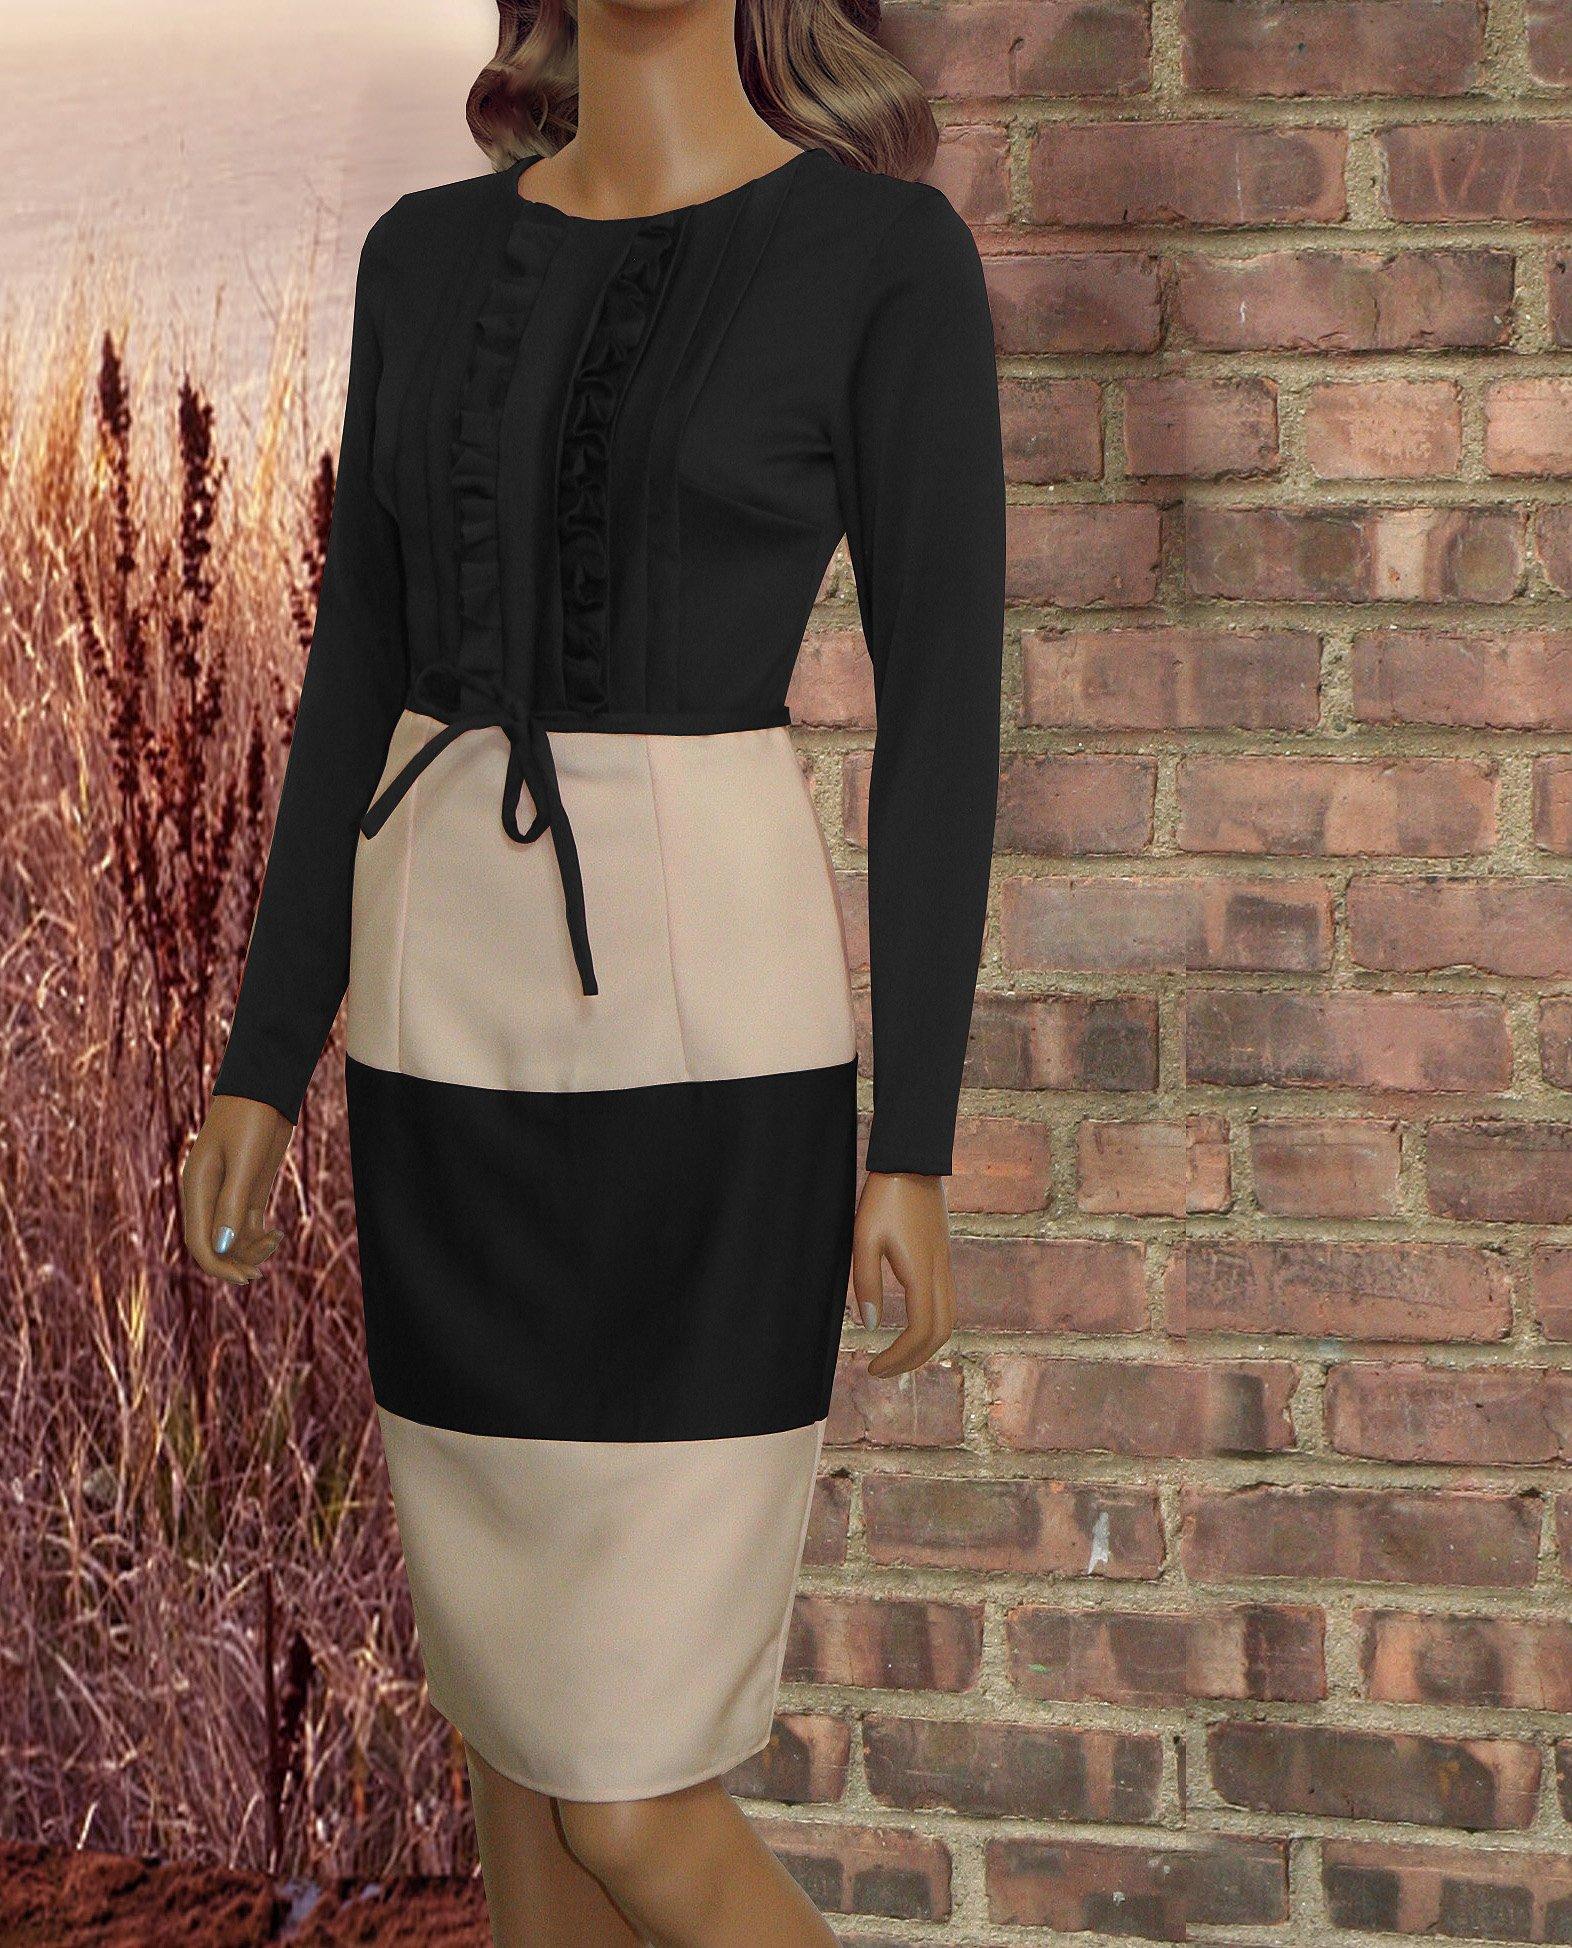 fed17728 Cardiff Nude & Black Knee Length Two Toned Dress #sheathdress  #modestfashion #modestweddingdress #modesty #modestwear #modestdress